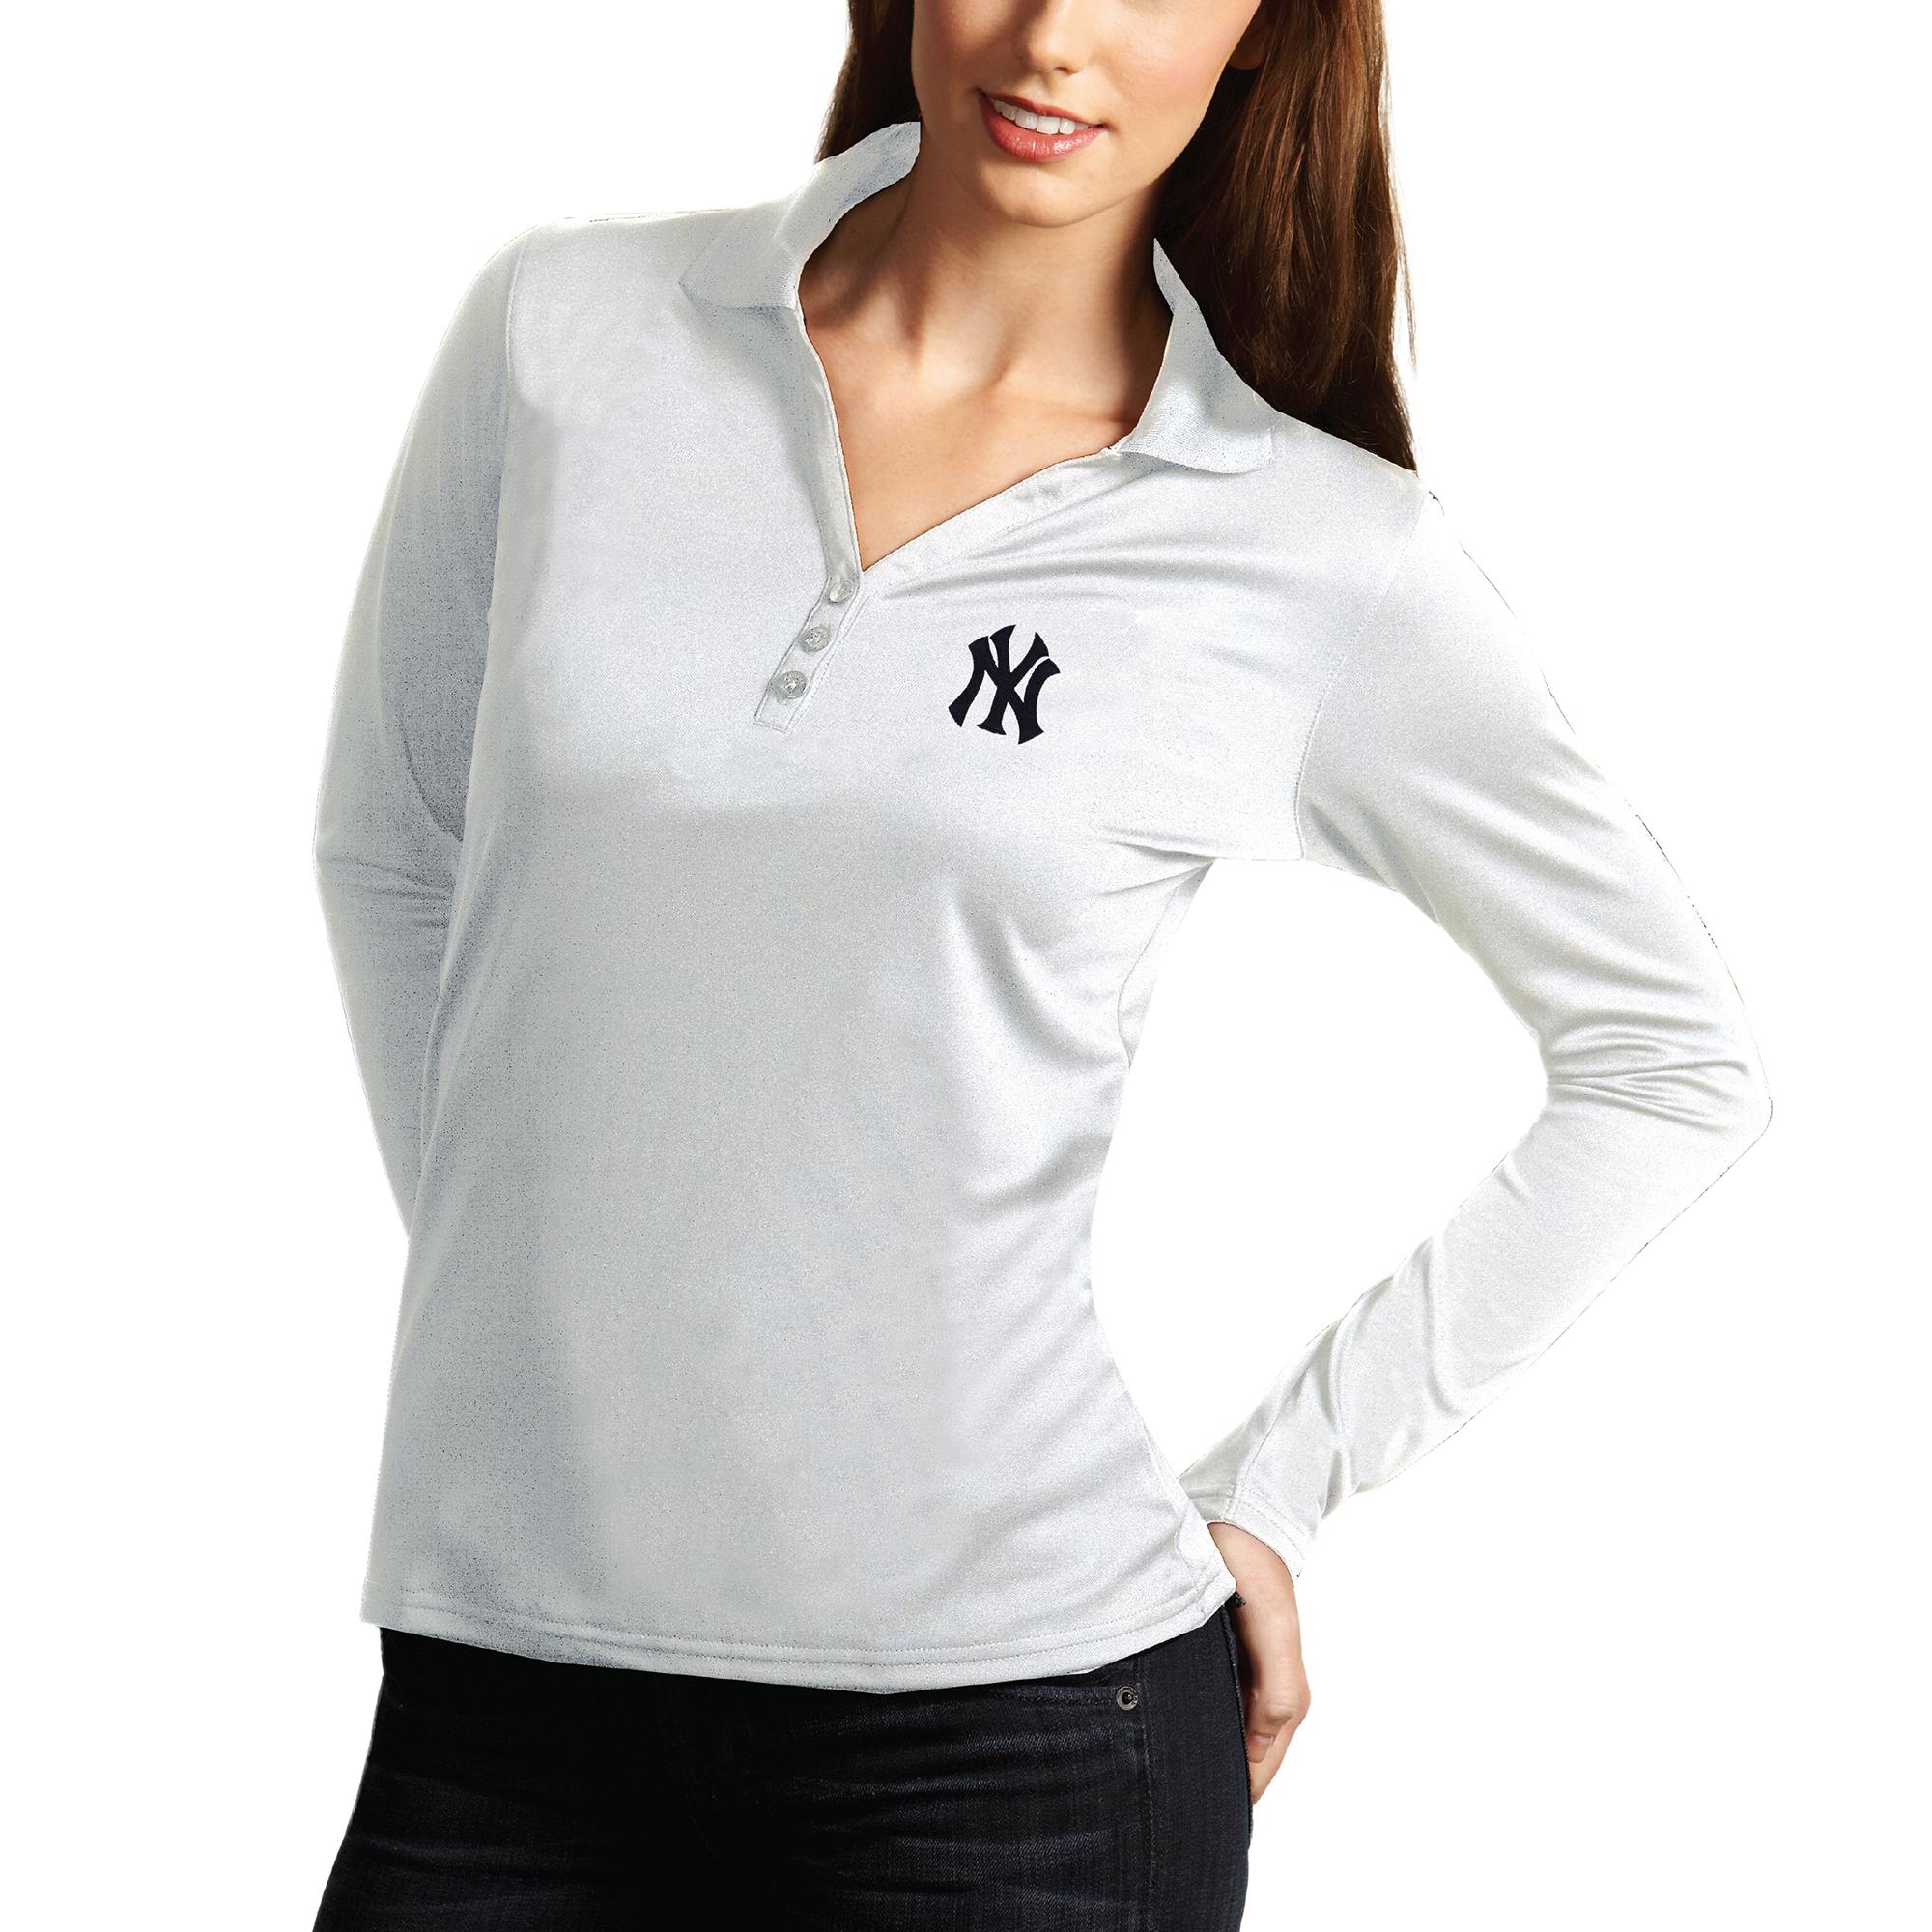 New York Yankees Antigua Women's Desert Dry Xtra Lite Exceed Long Sleeve Polo - White